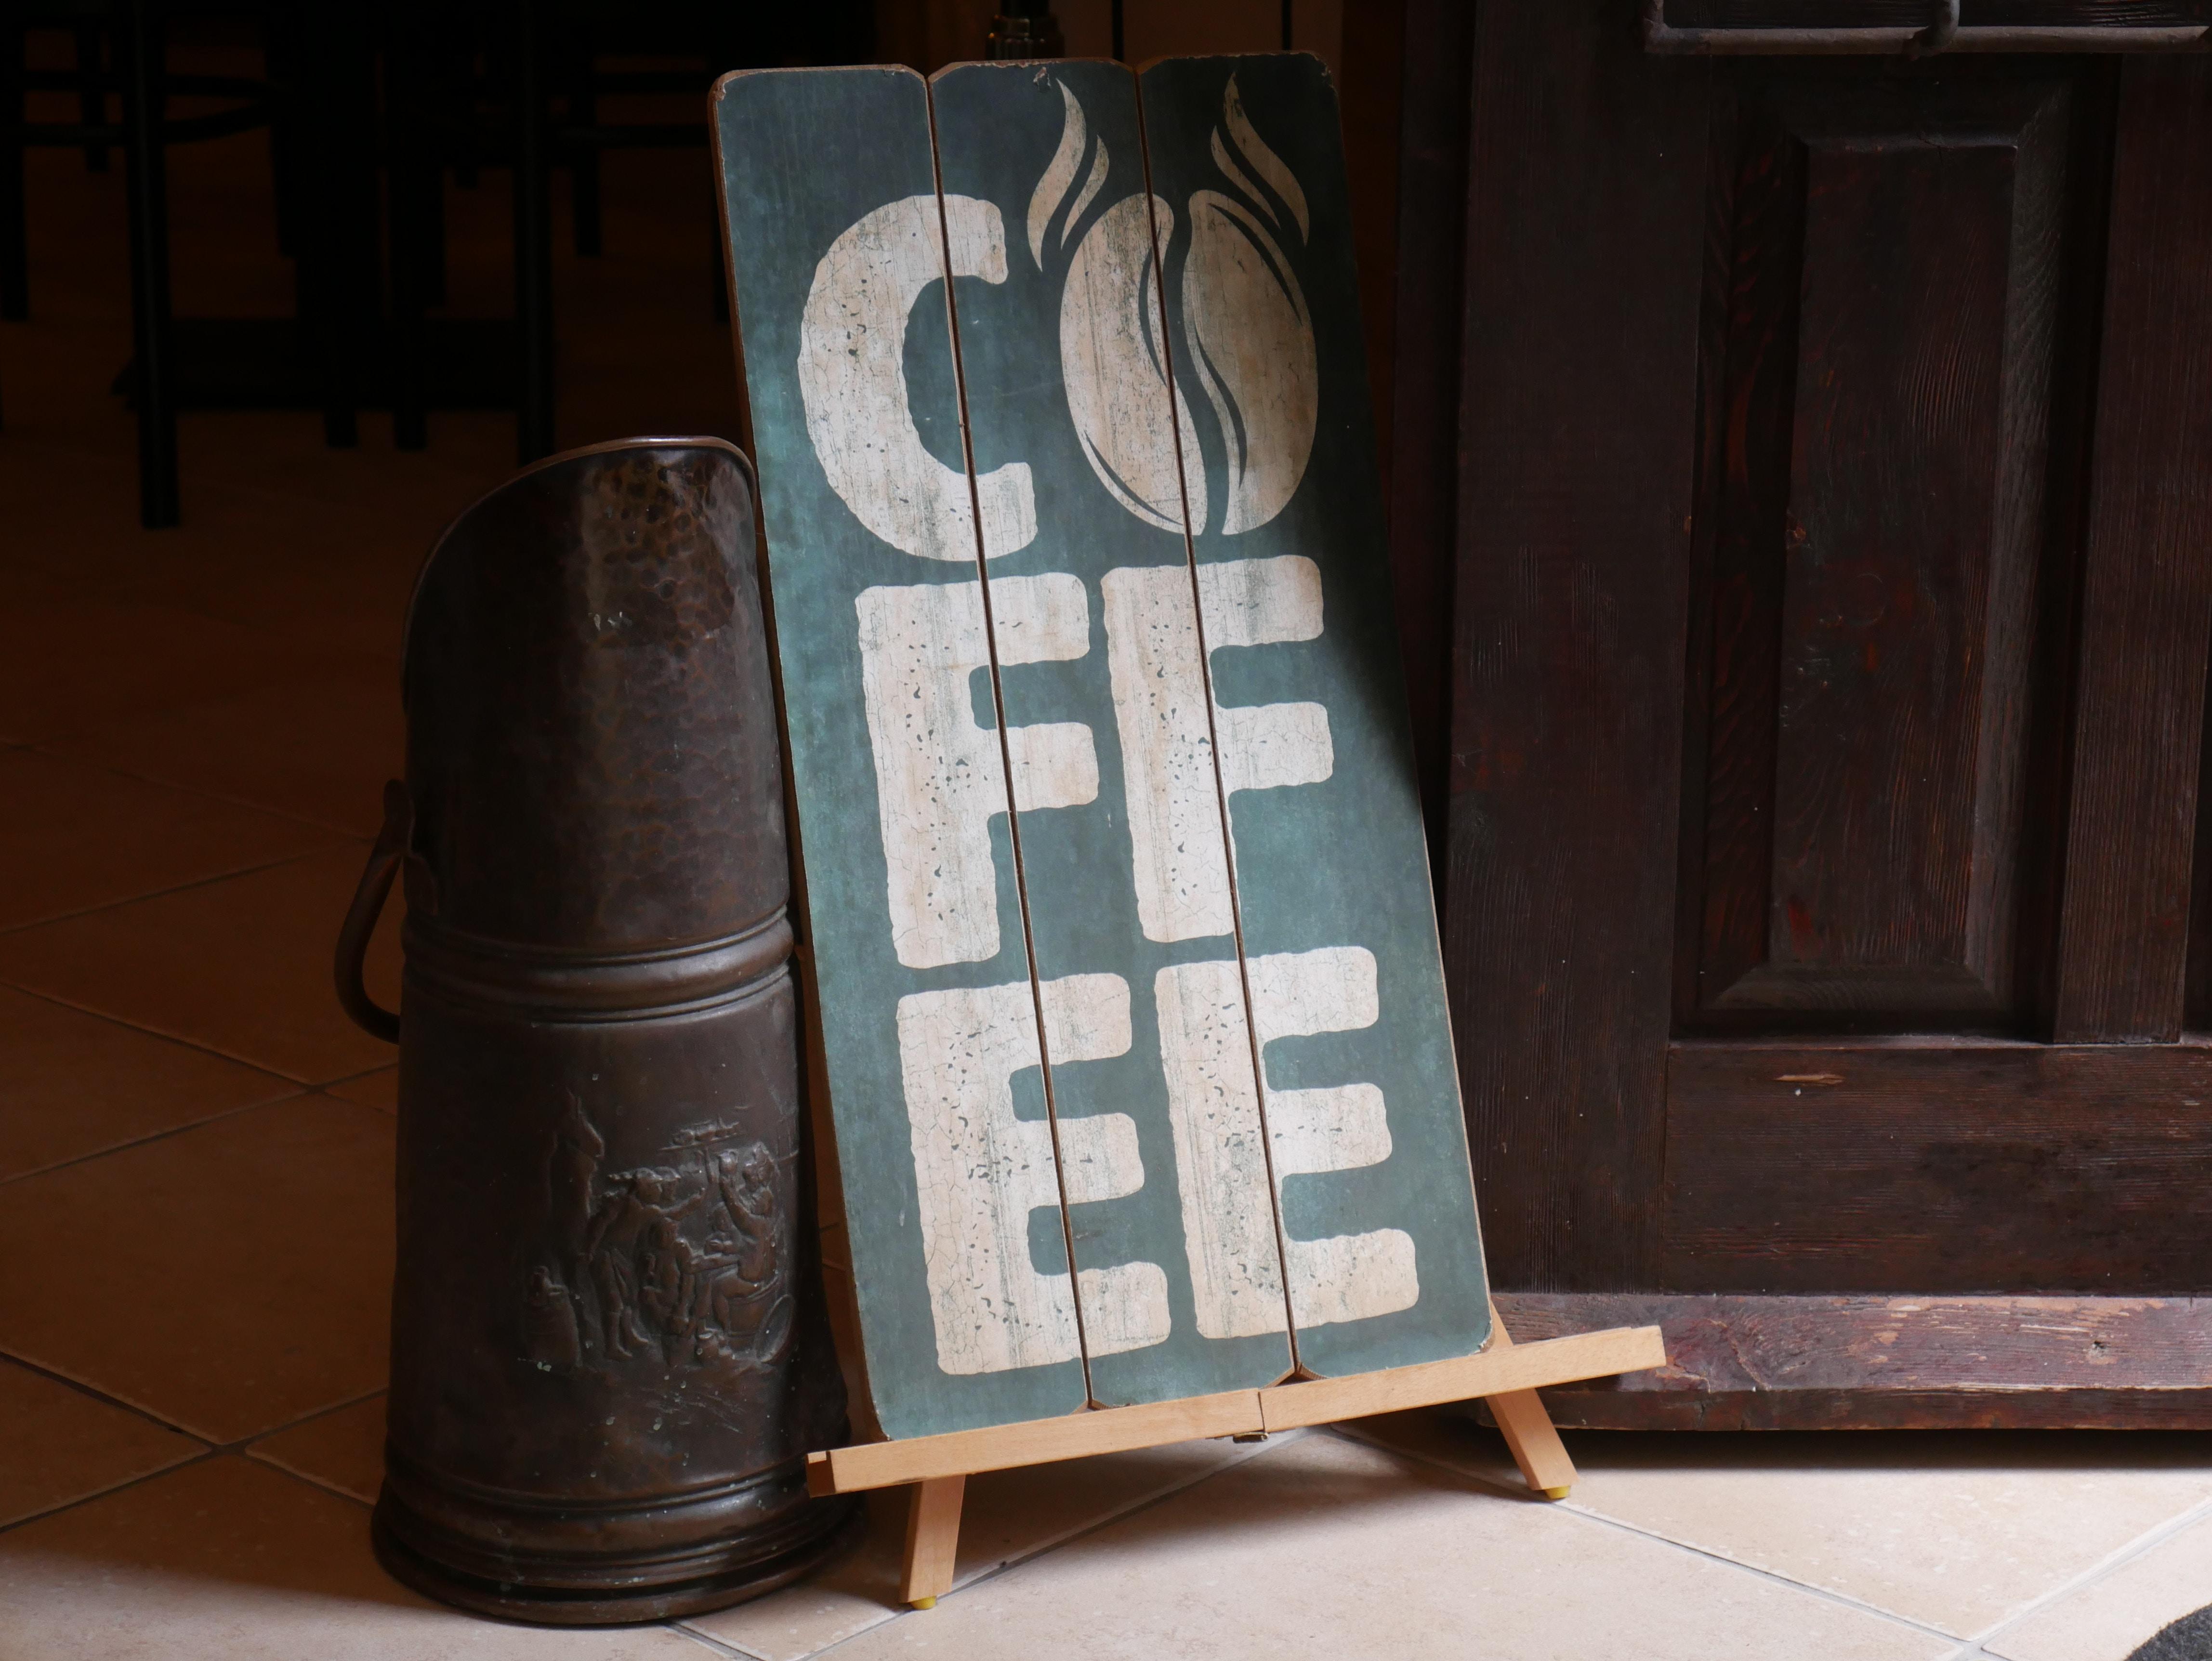 Coffee signboard near door